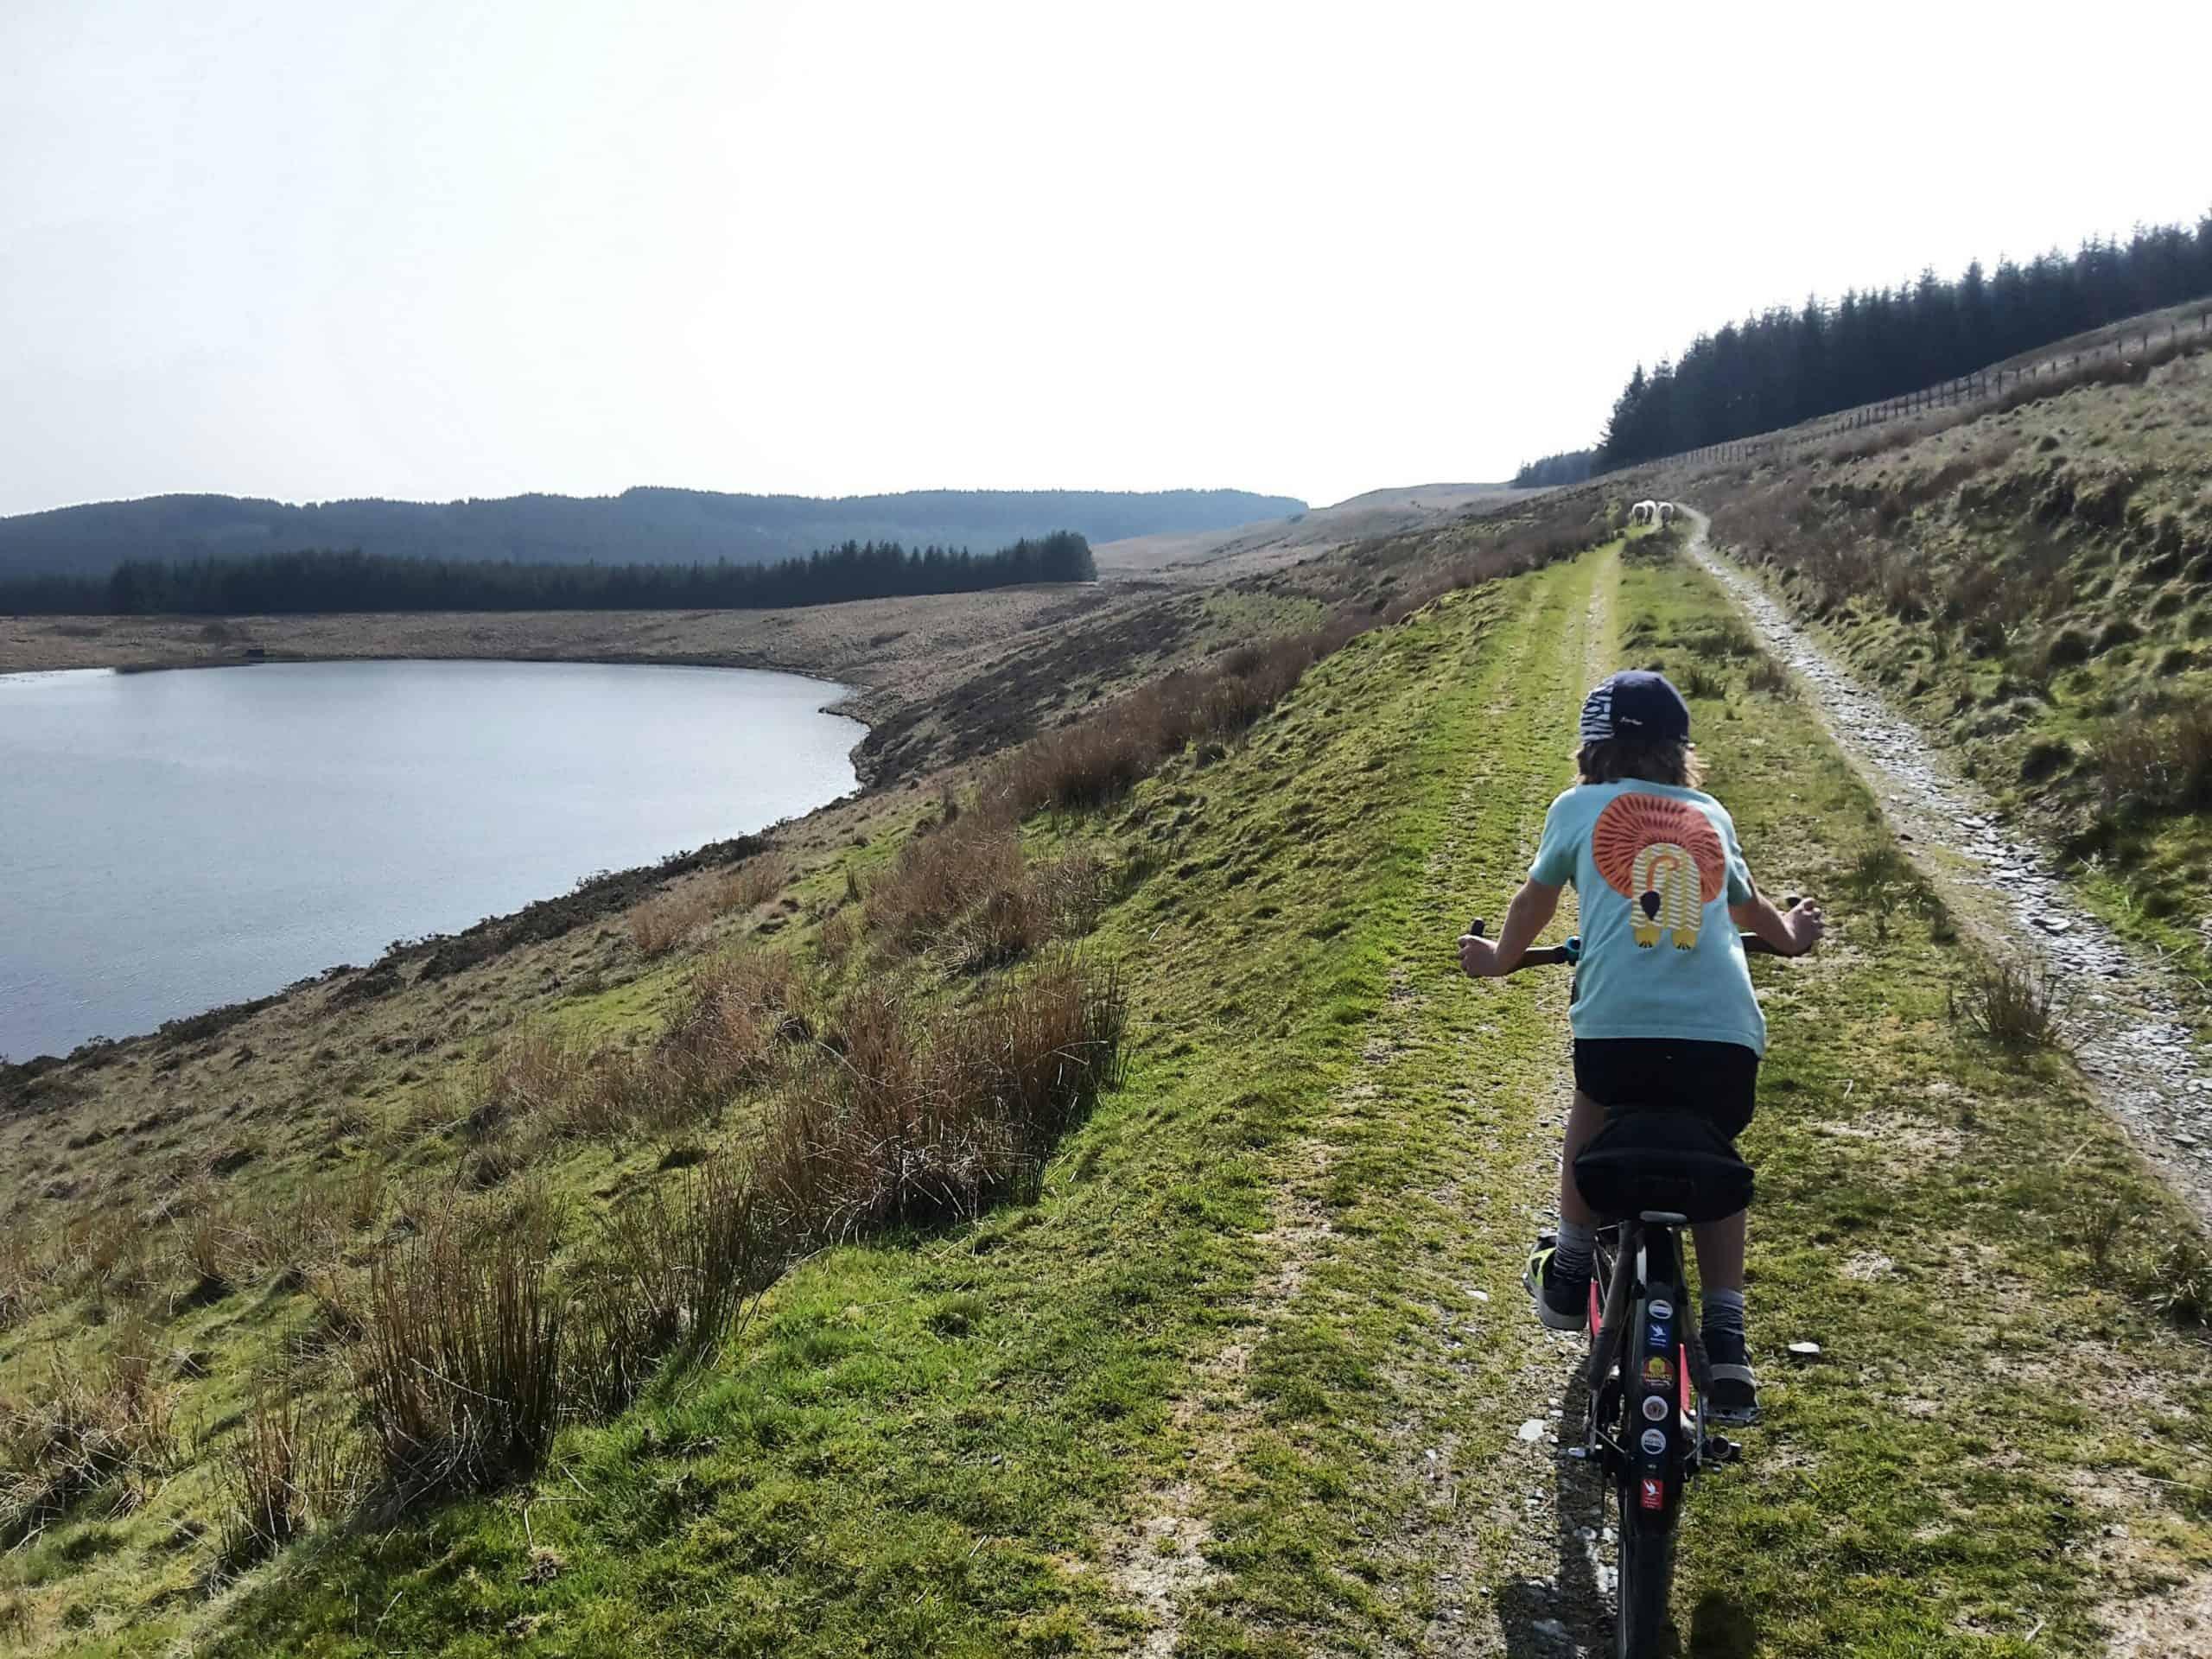 Snowdonia: Climbing Up, Riding Back 97